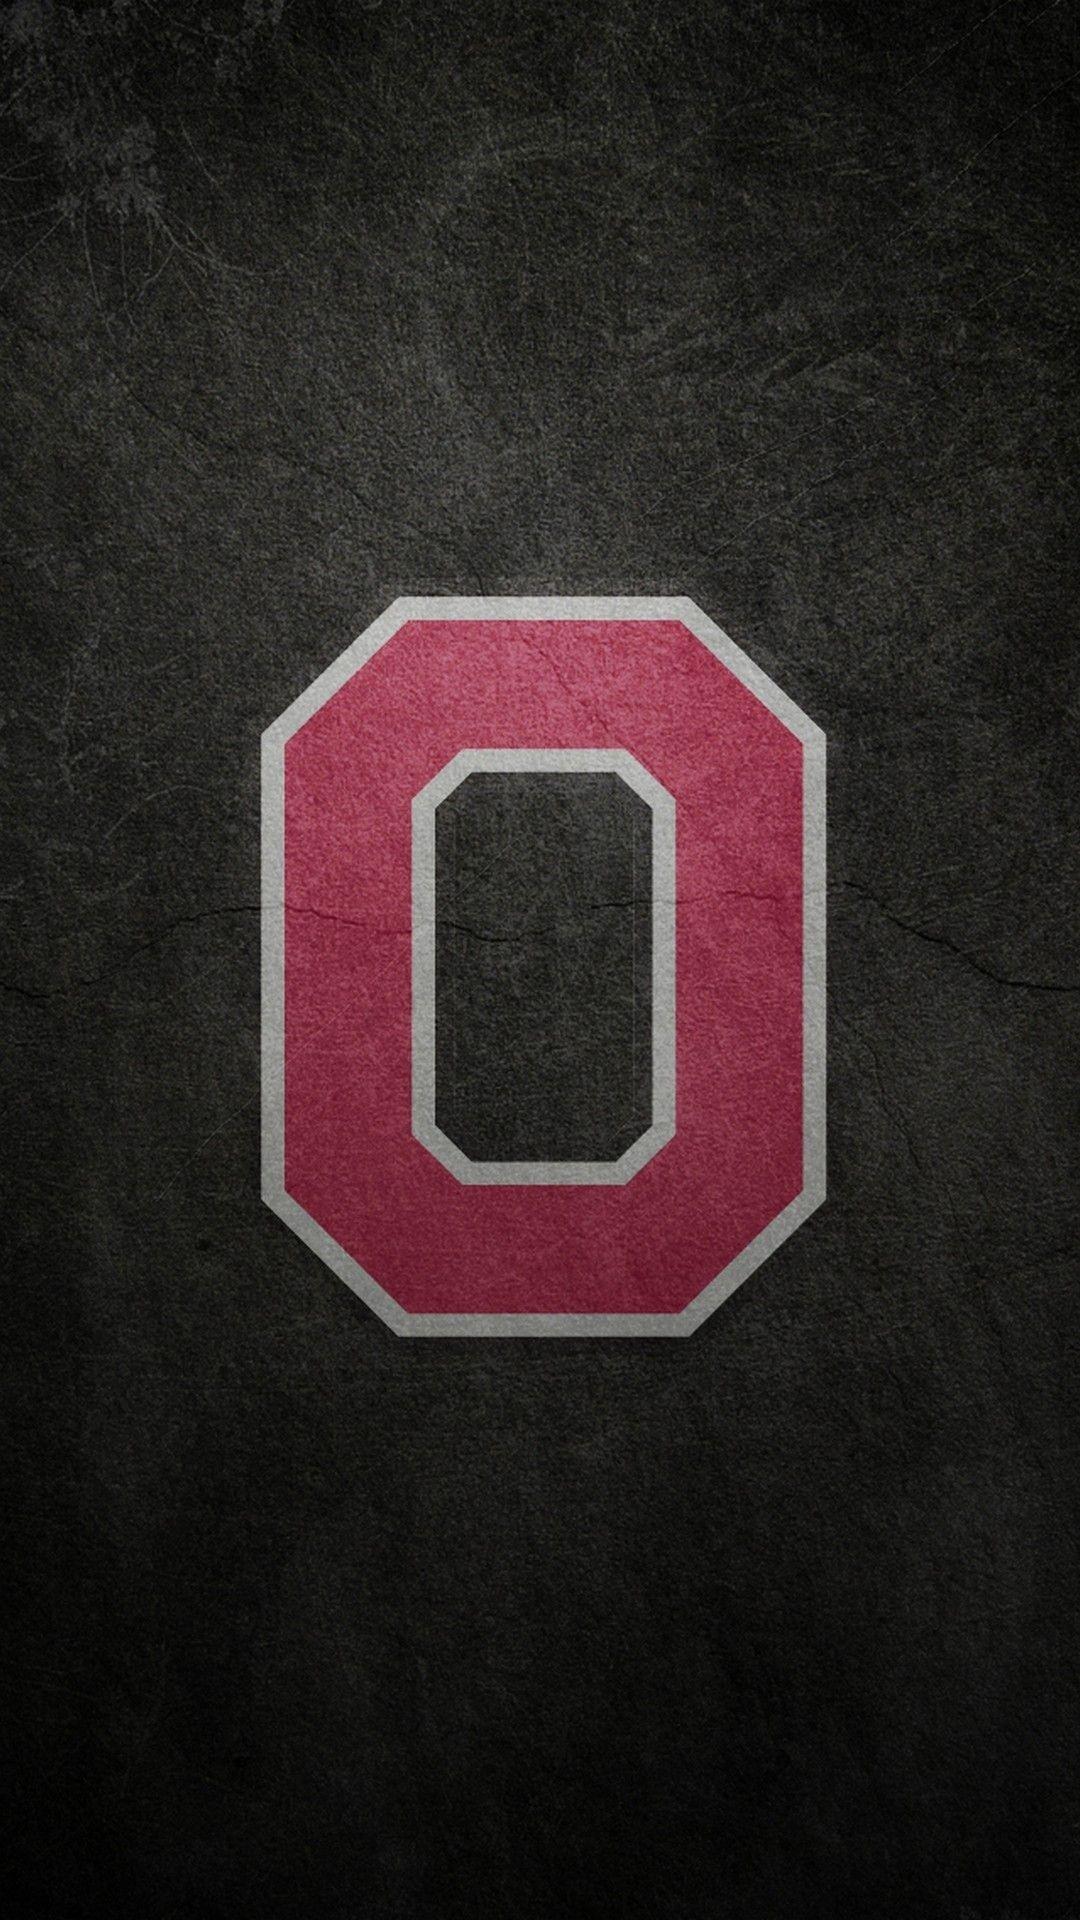 Cool ohio state wallpaper iphone ohio state wallpaper